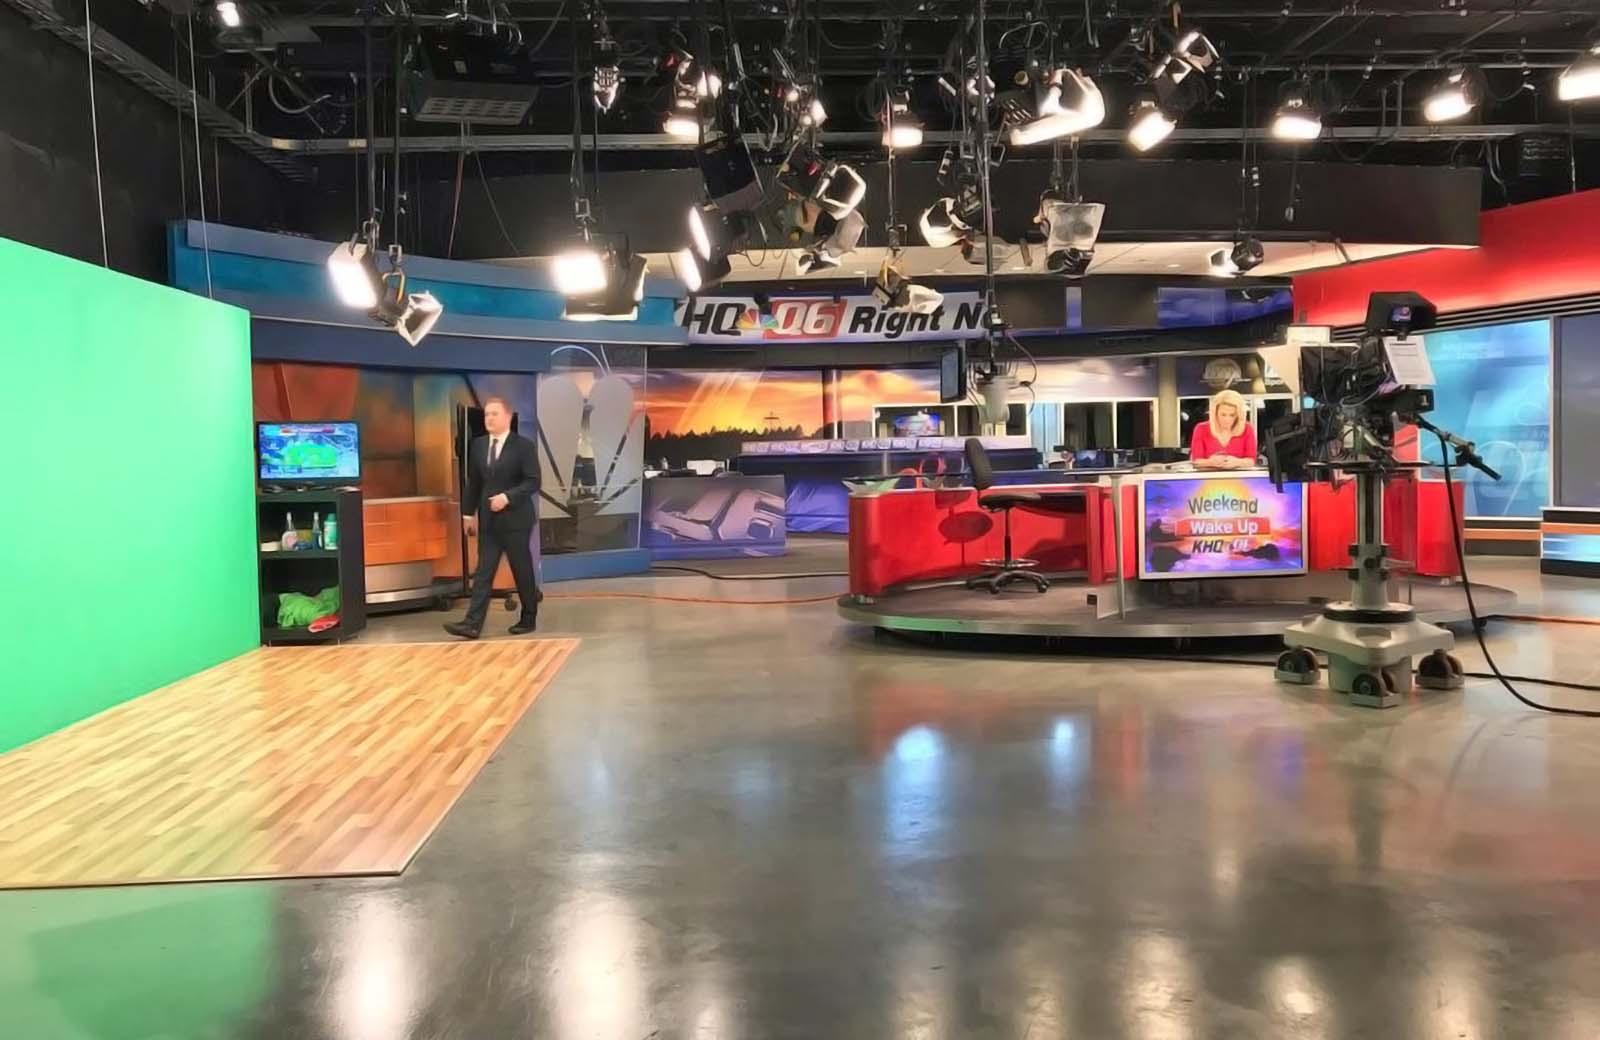 KHQ Local News studio